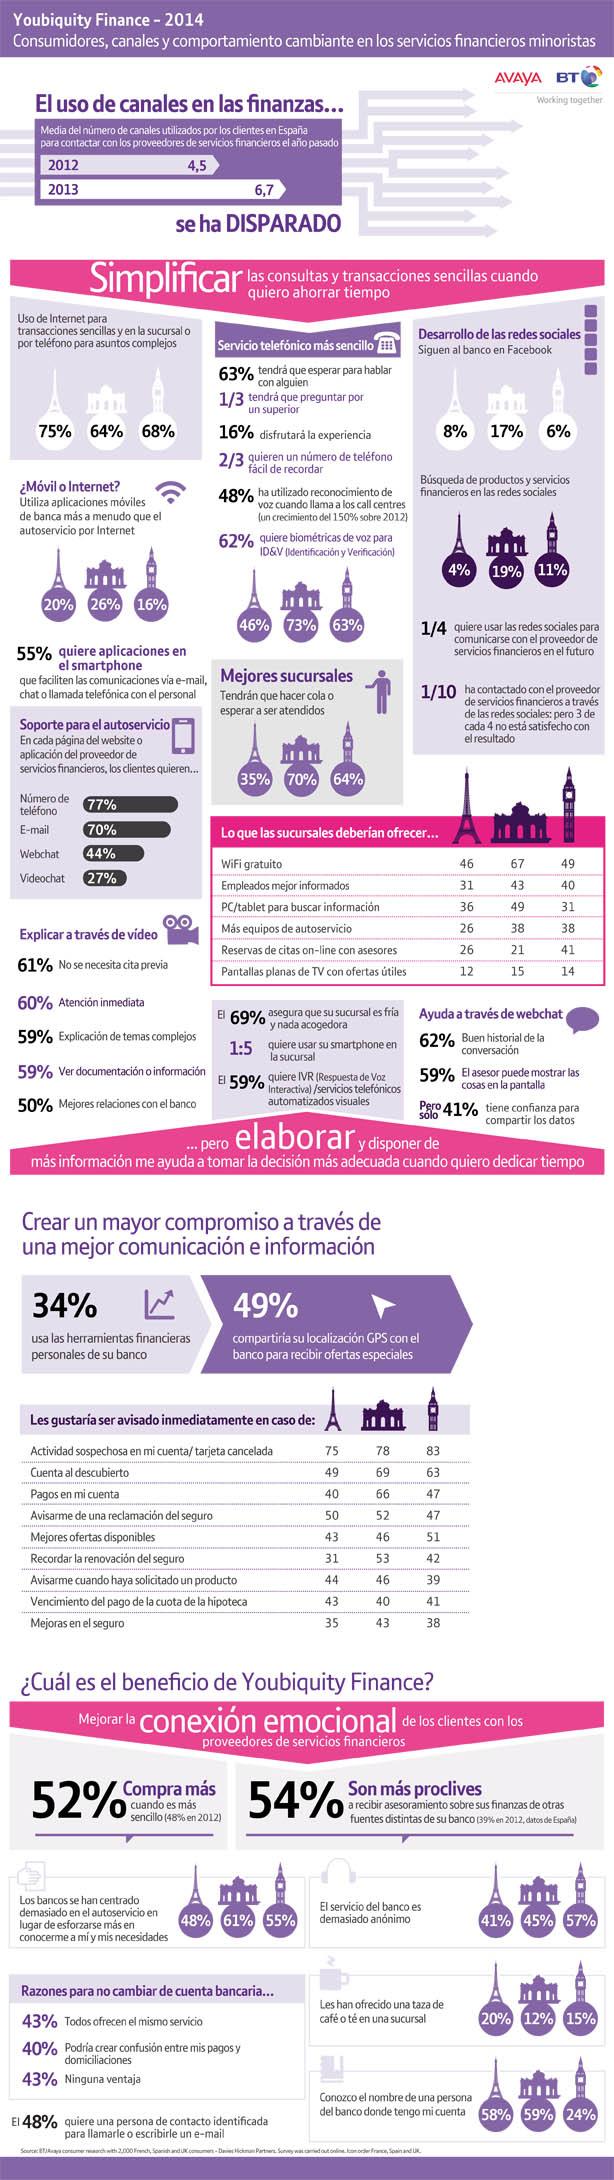 bt_avaya_infografia